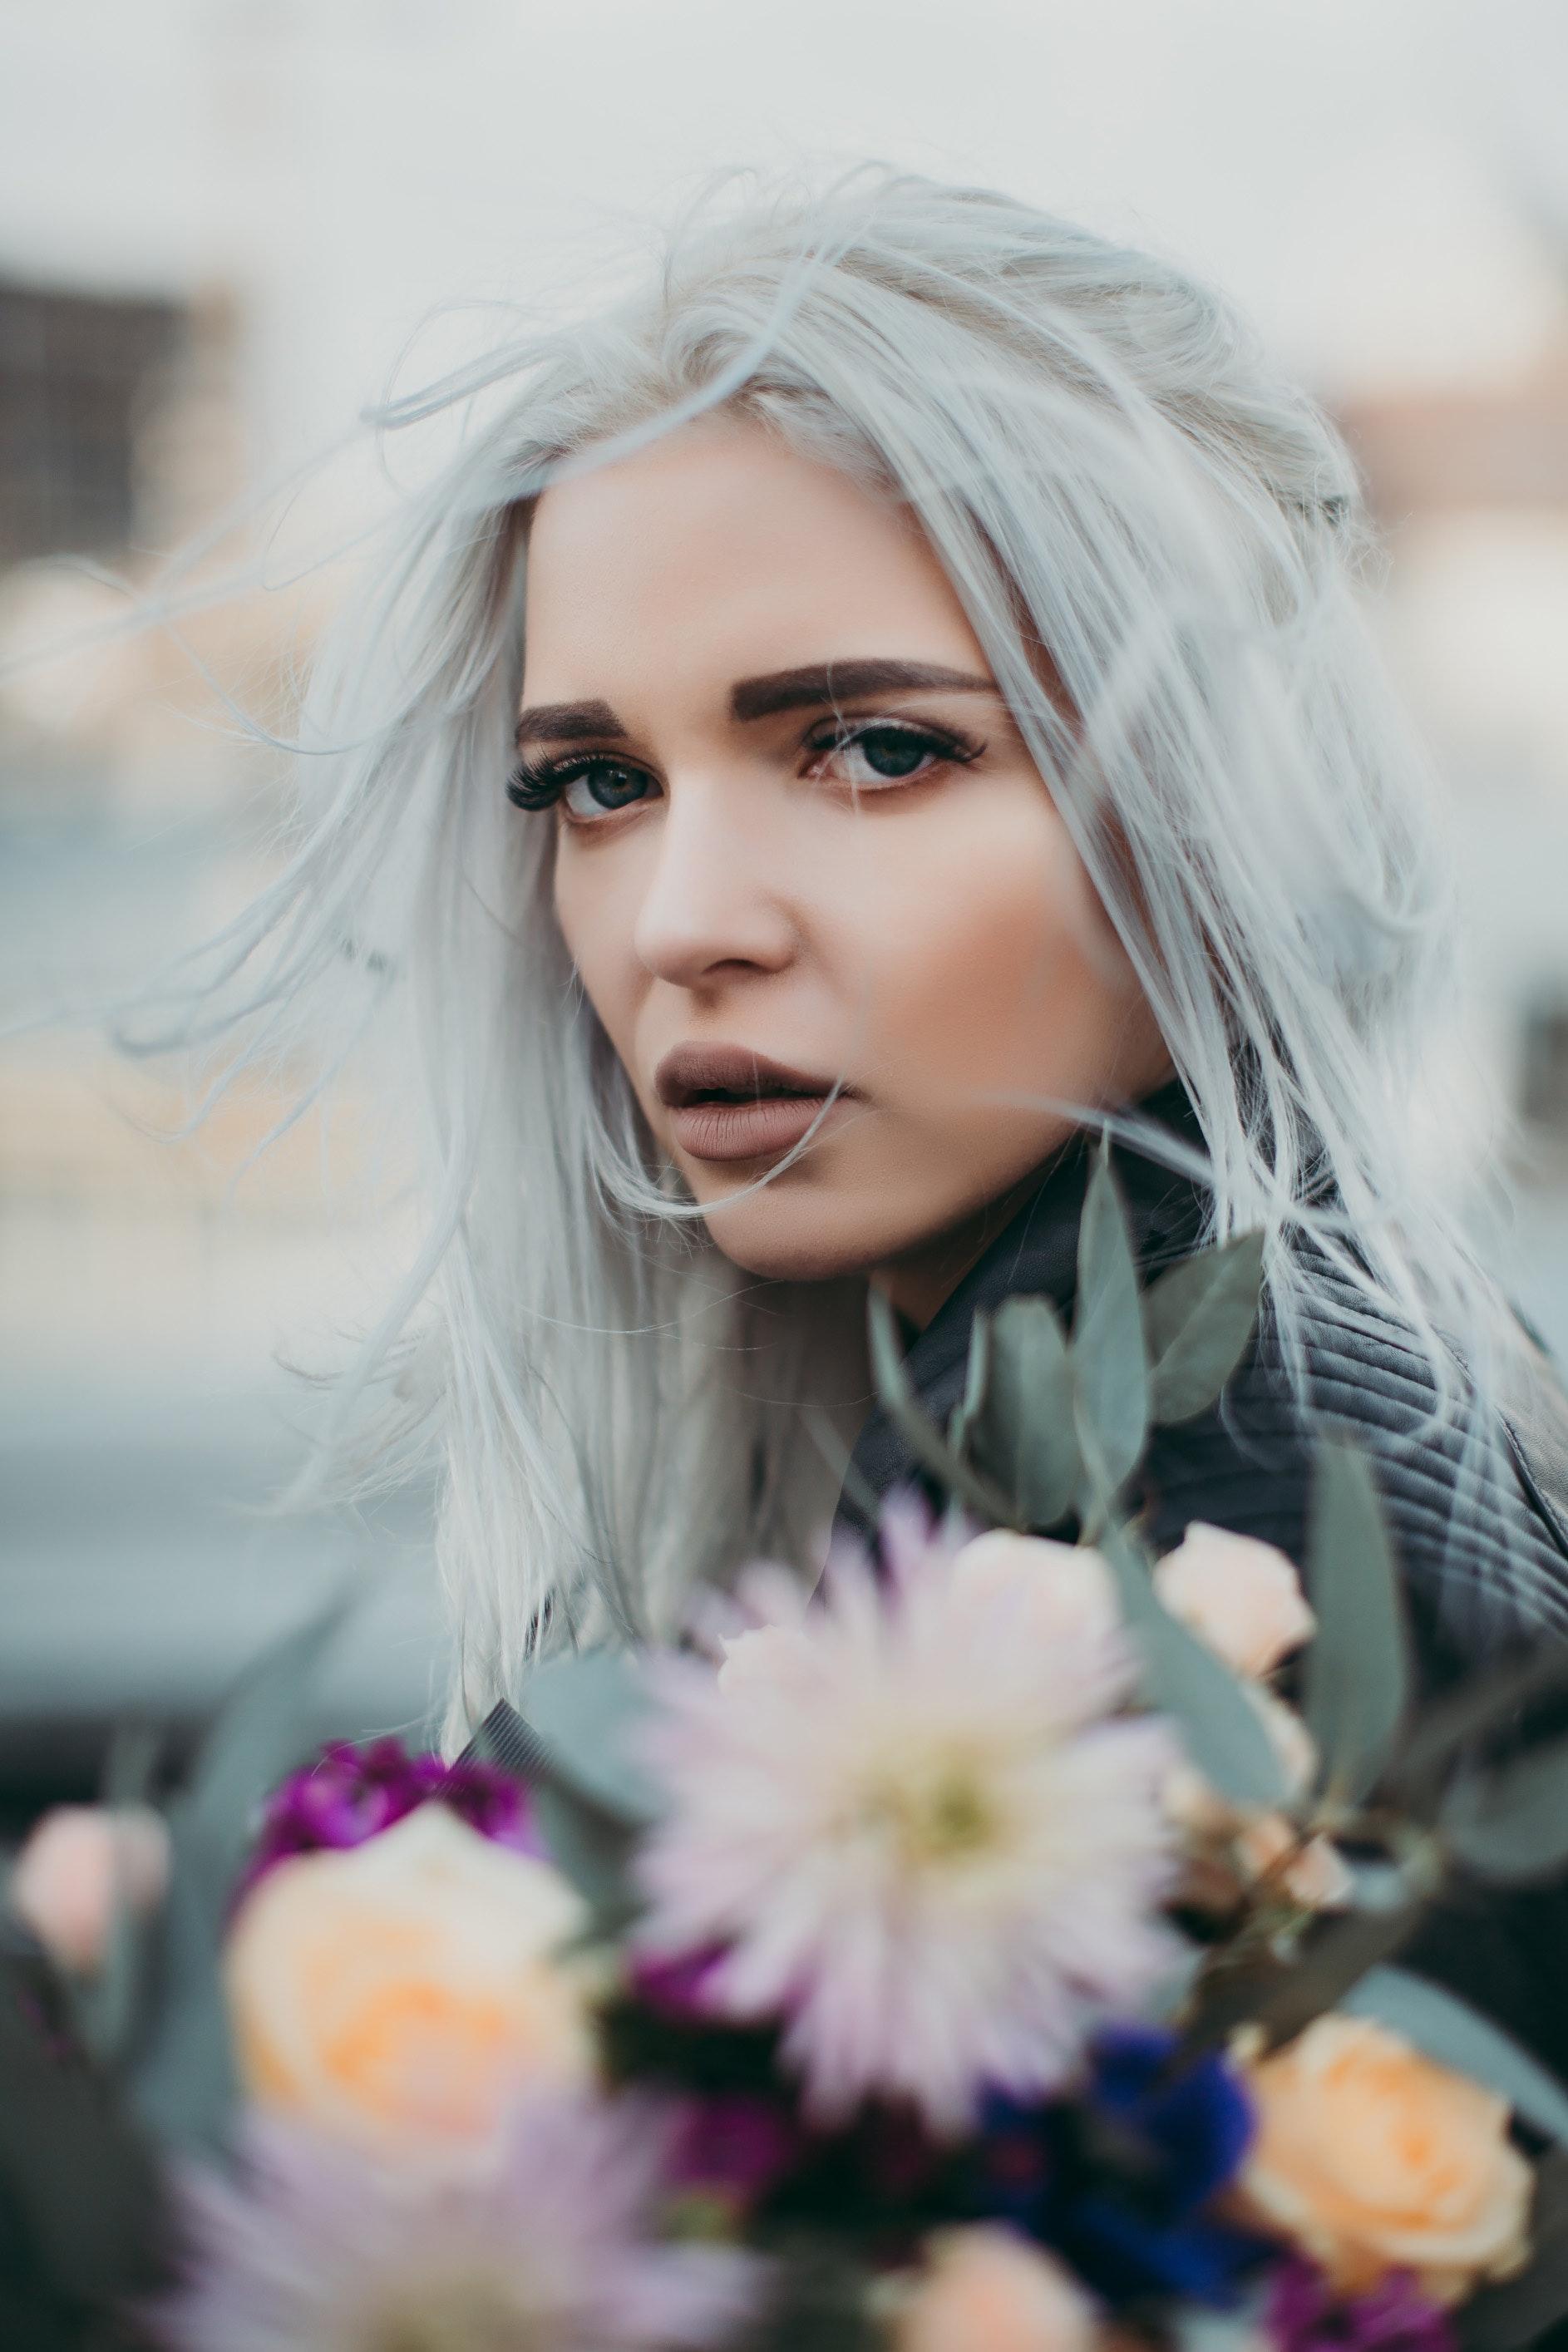 woman-carrying-flowers-closeup-photo-103